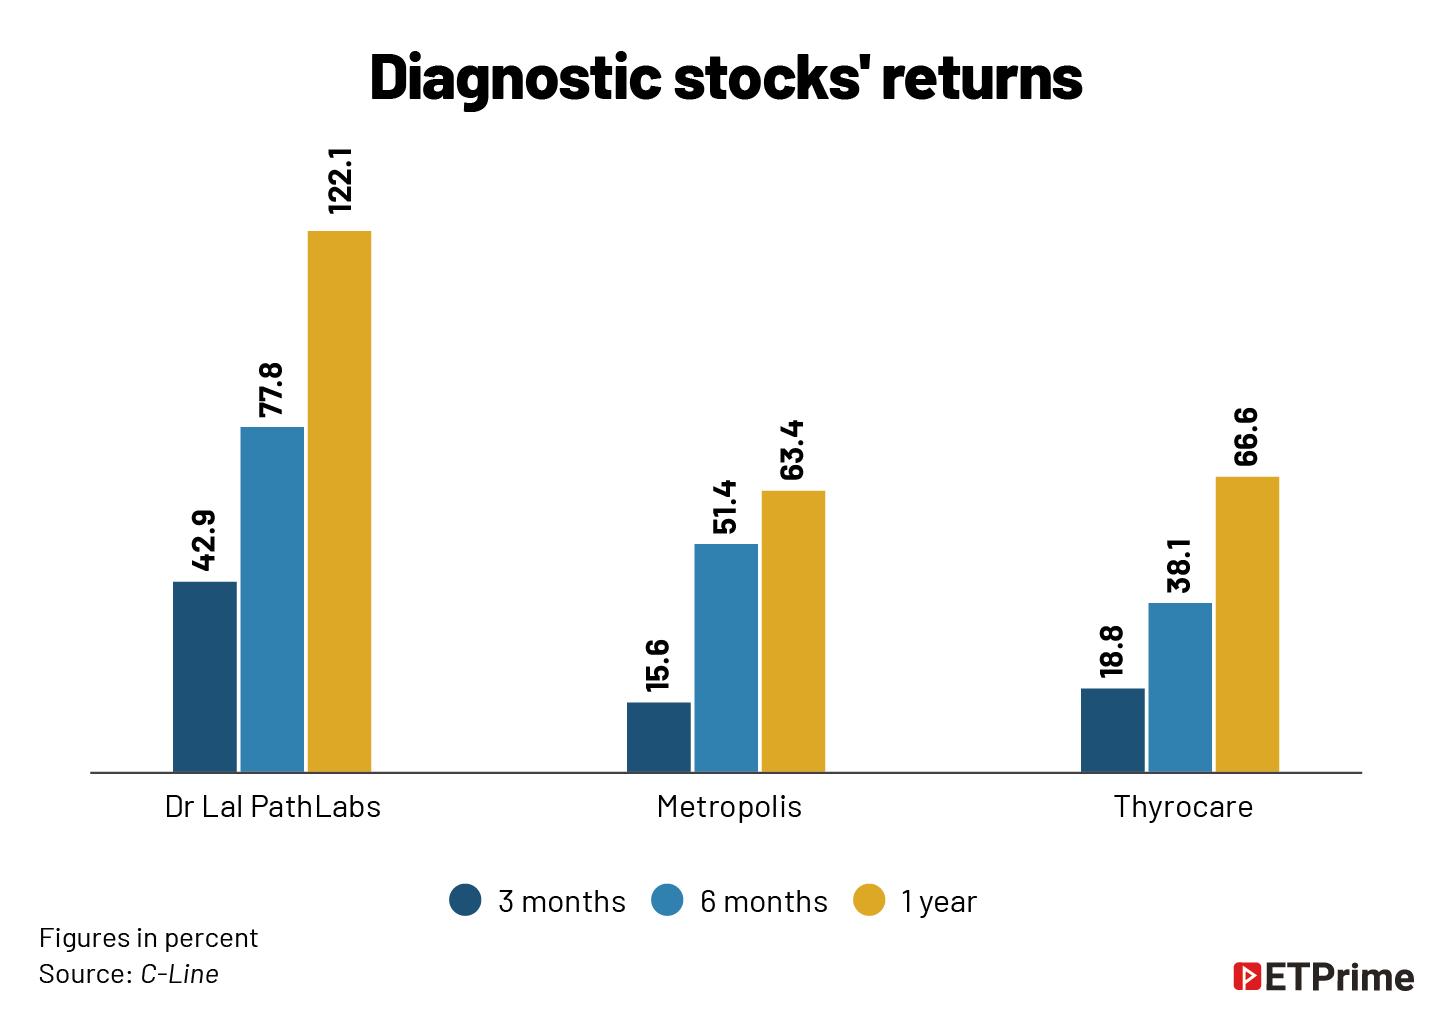 Diagnostic stocks' returns @2x